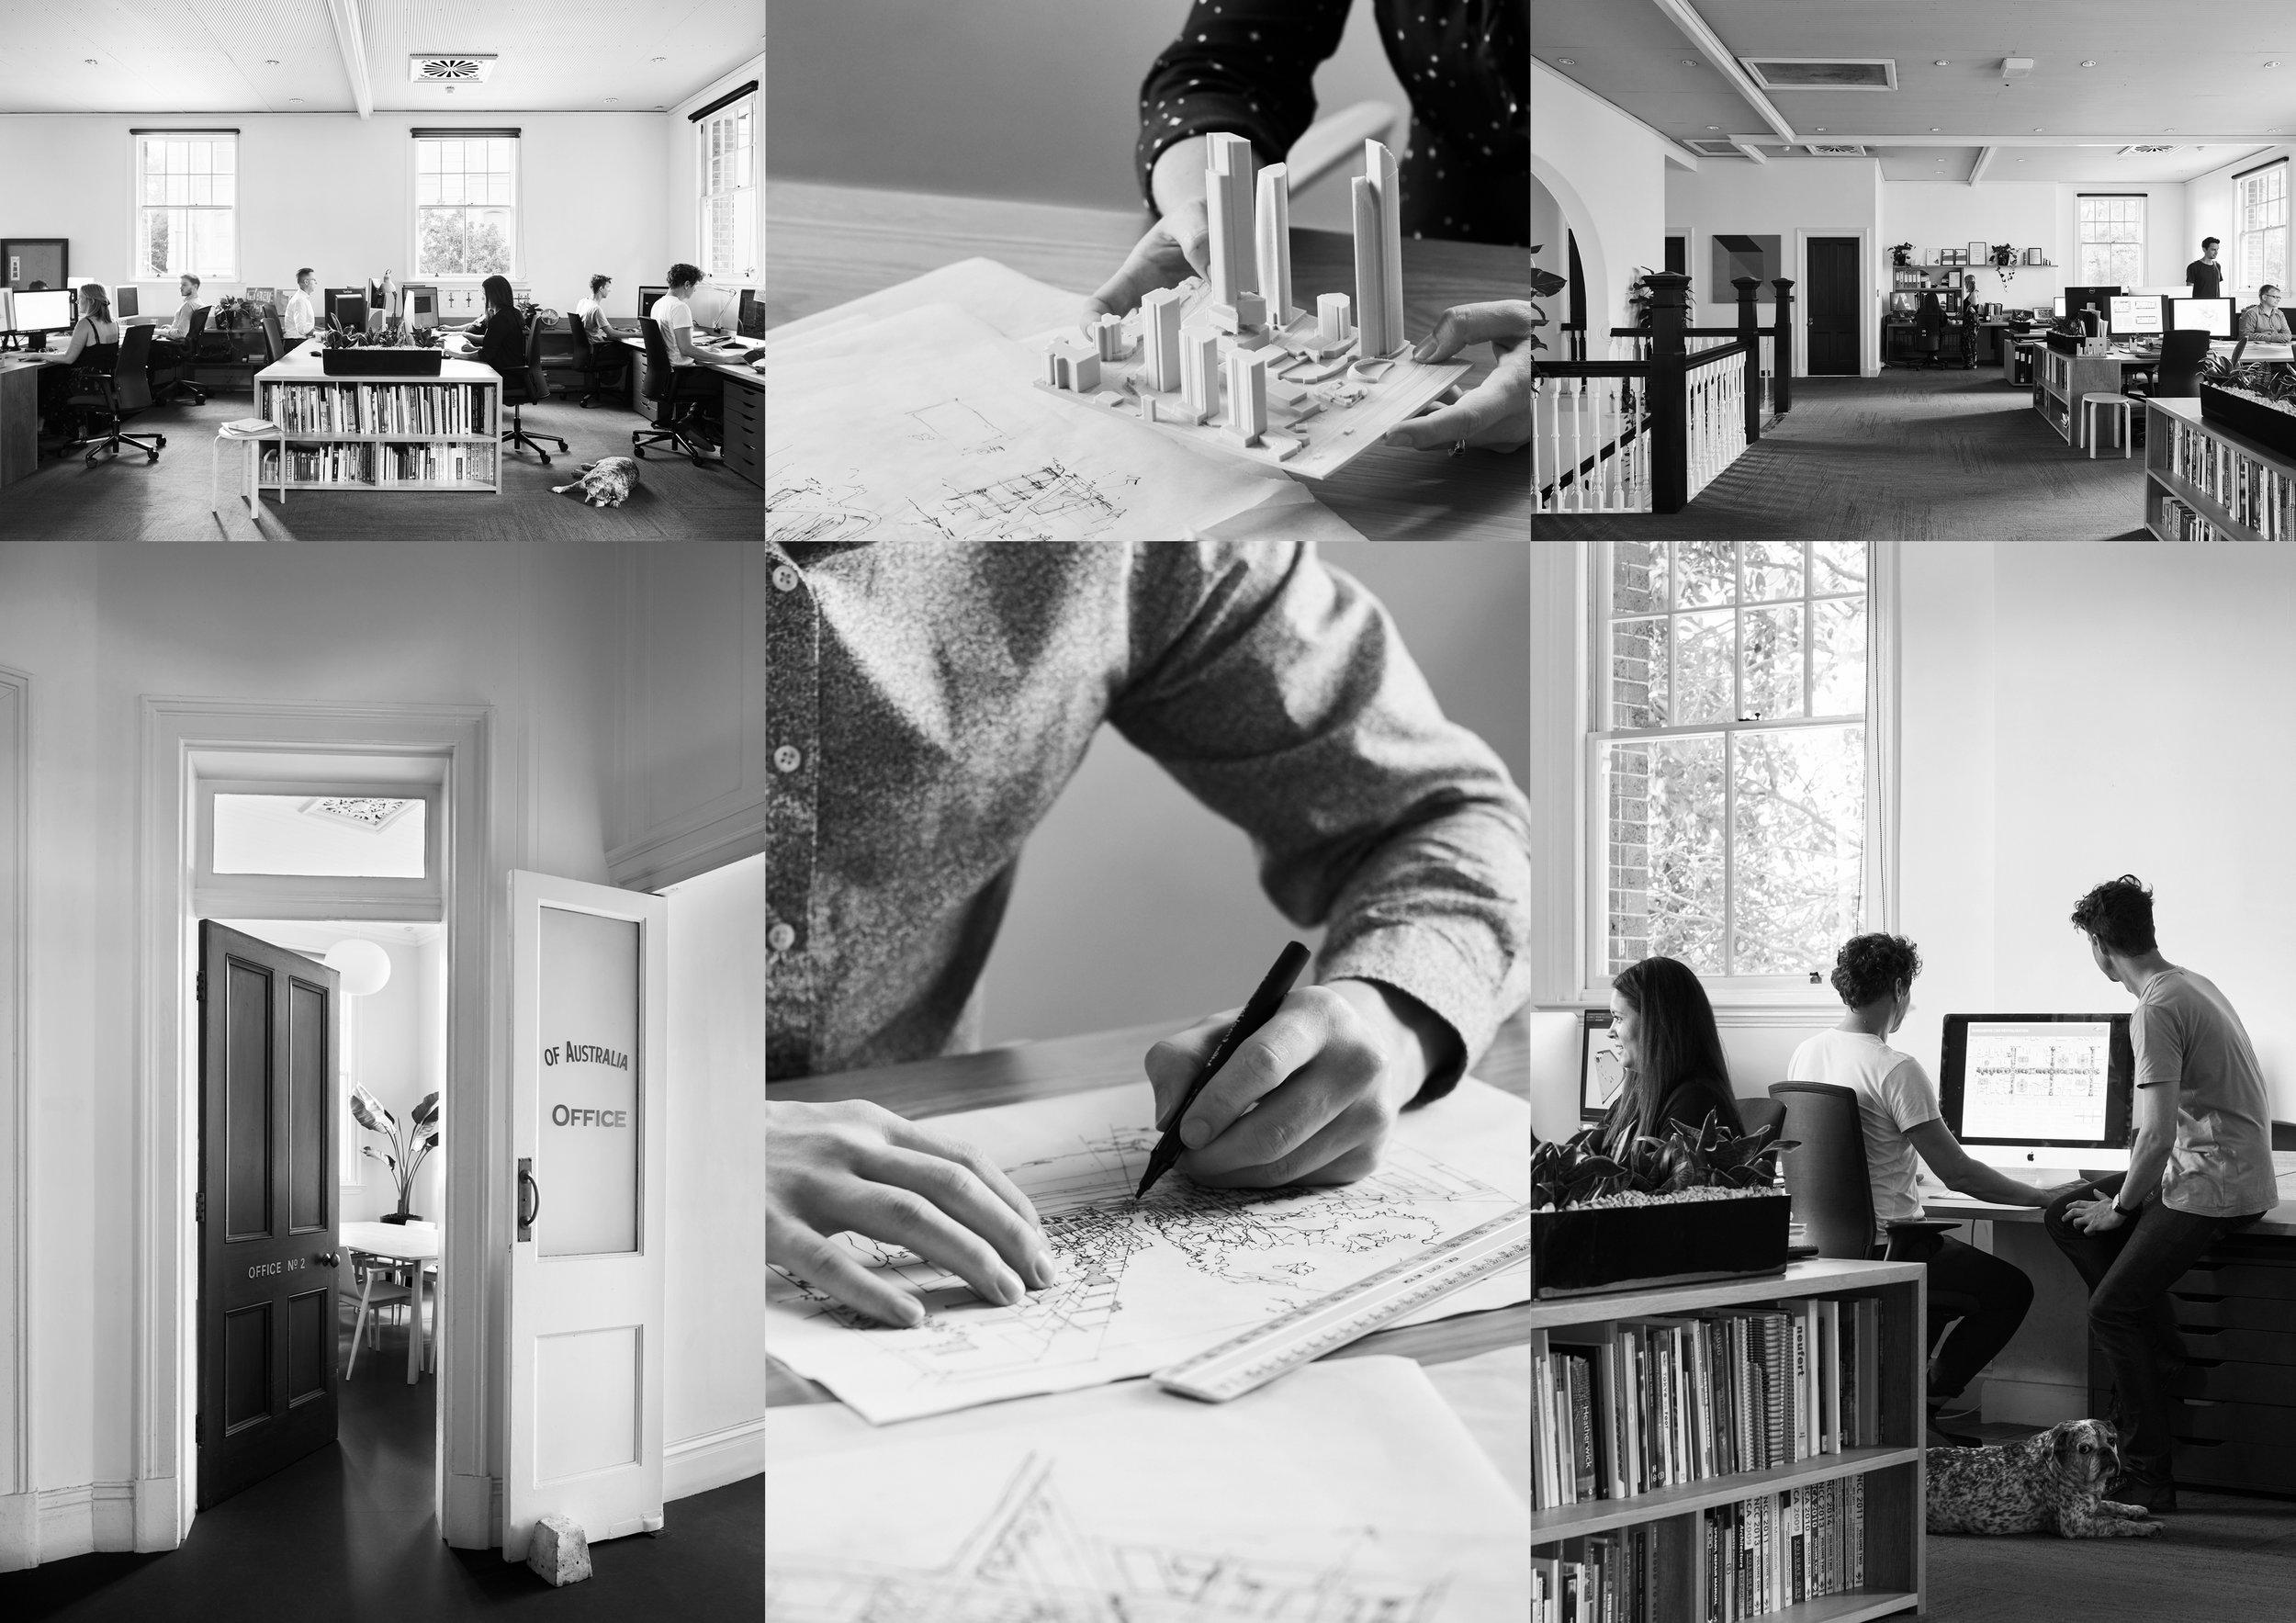 Office Collage.jpg